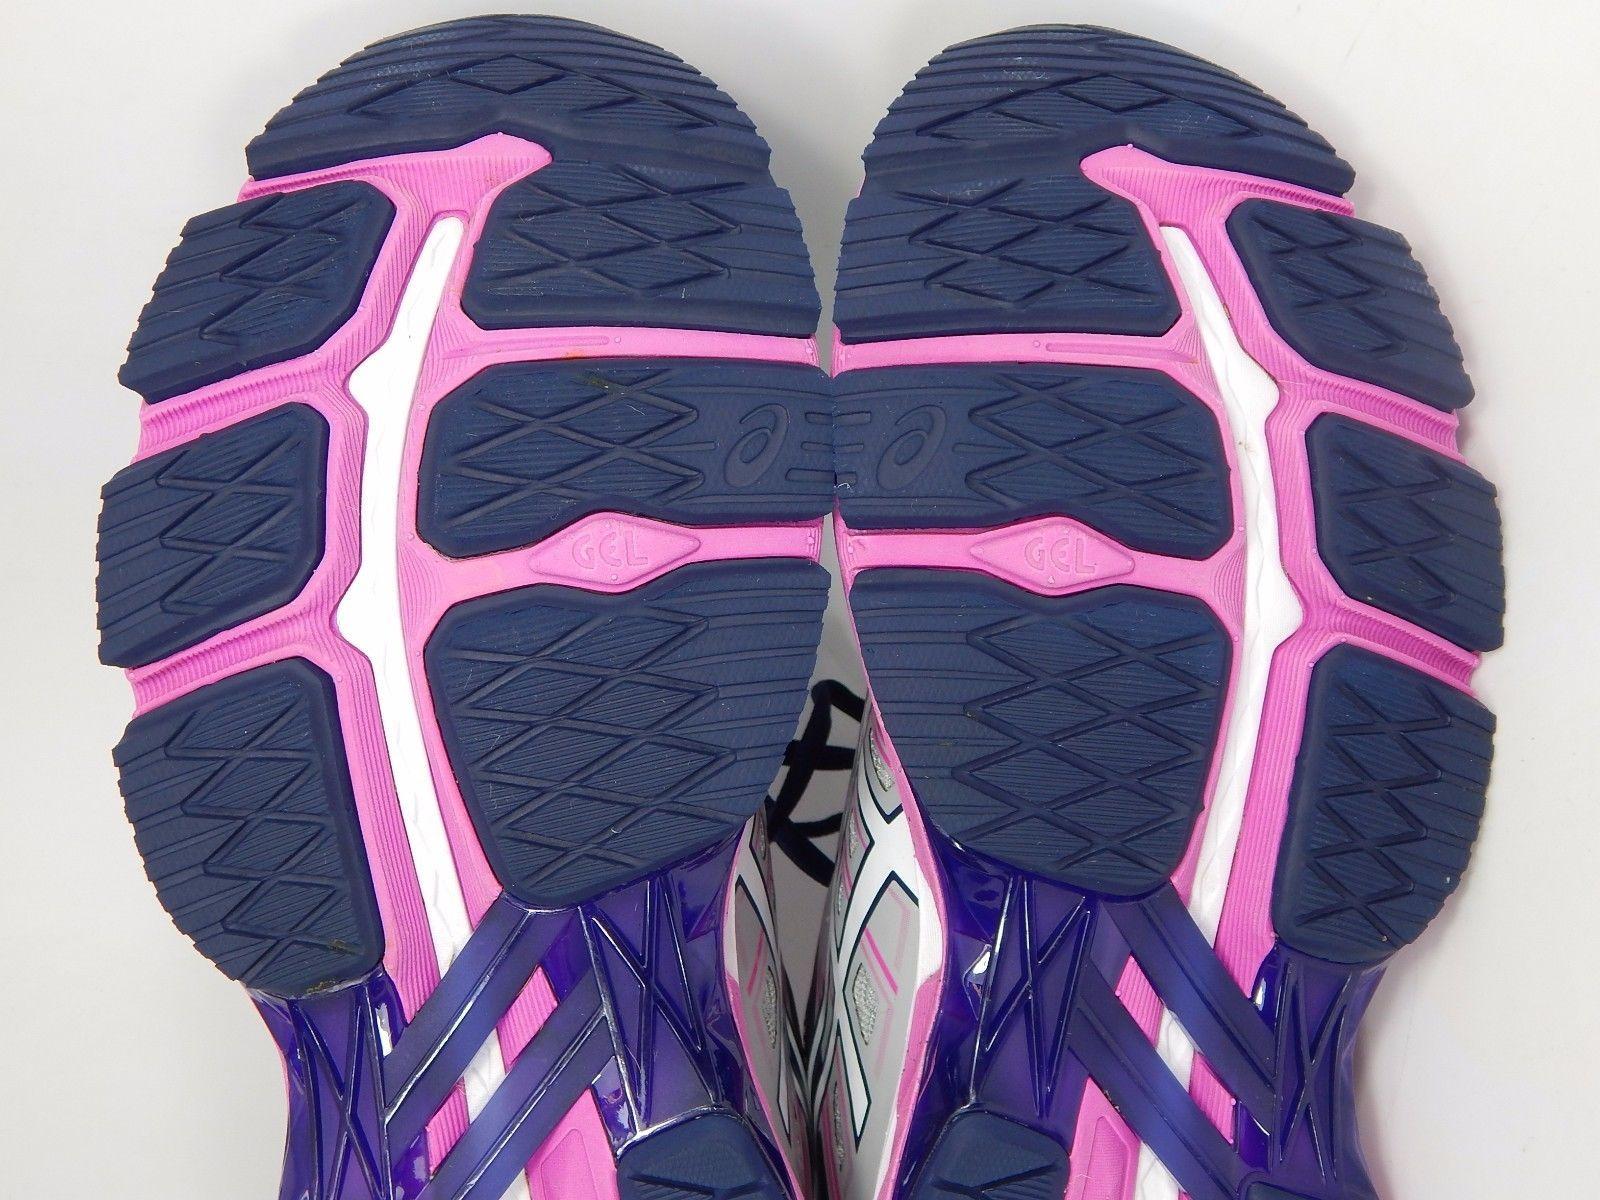 Asics GT 2000 v 5 Women's Running Shoes Size US 9.5 2A NARROW EU 41.5 T760N